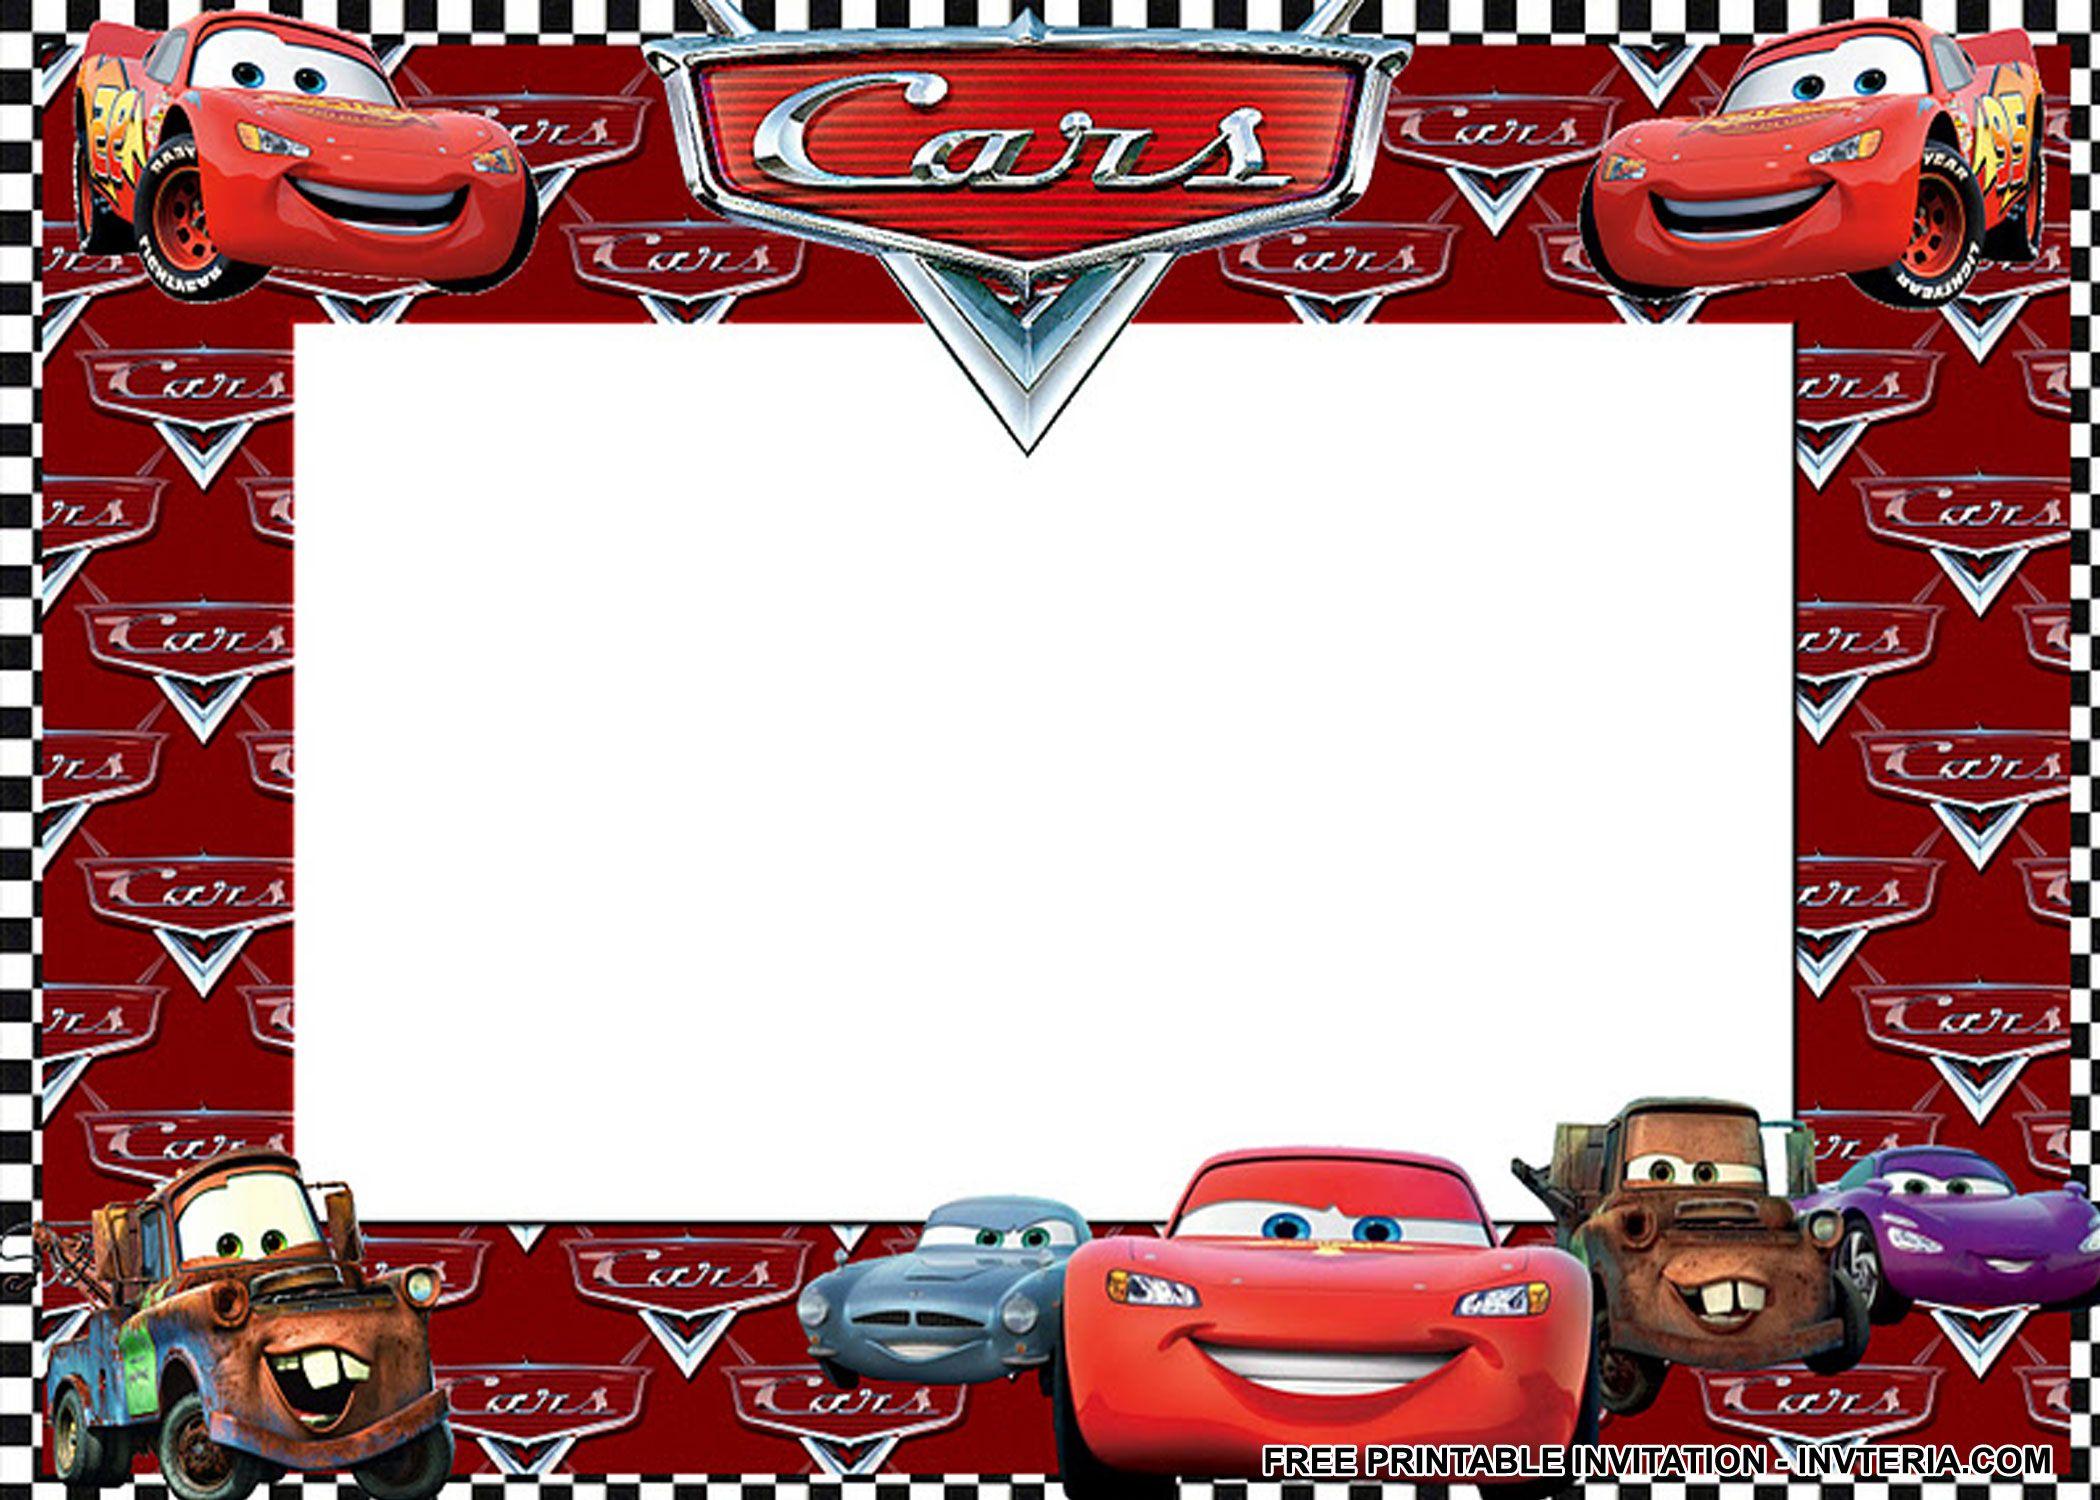 NICE BEST FREE PRINTABLE DISNEY CARS BIRTHDAY INVITATIONS IDEA ...